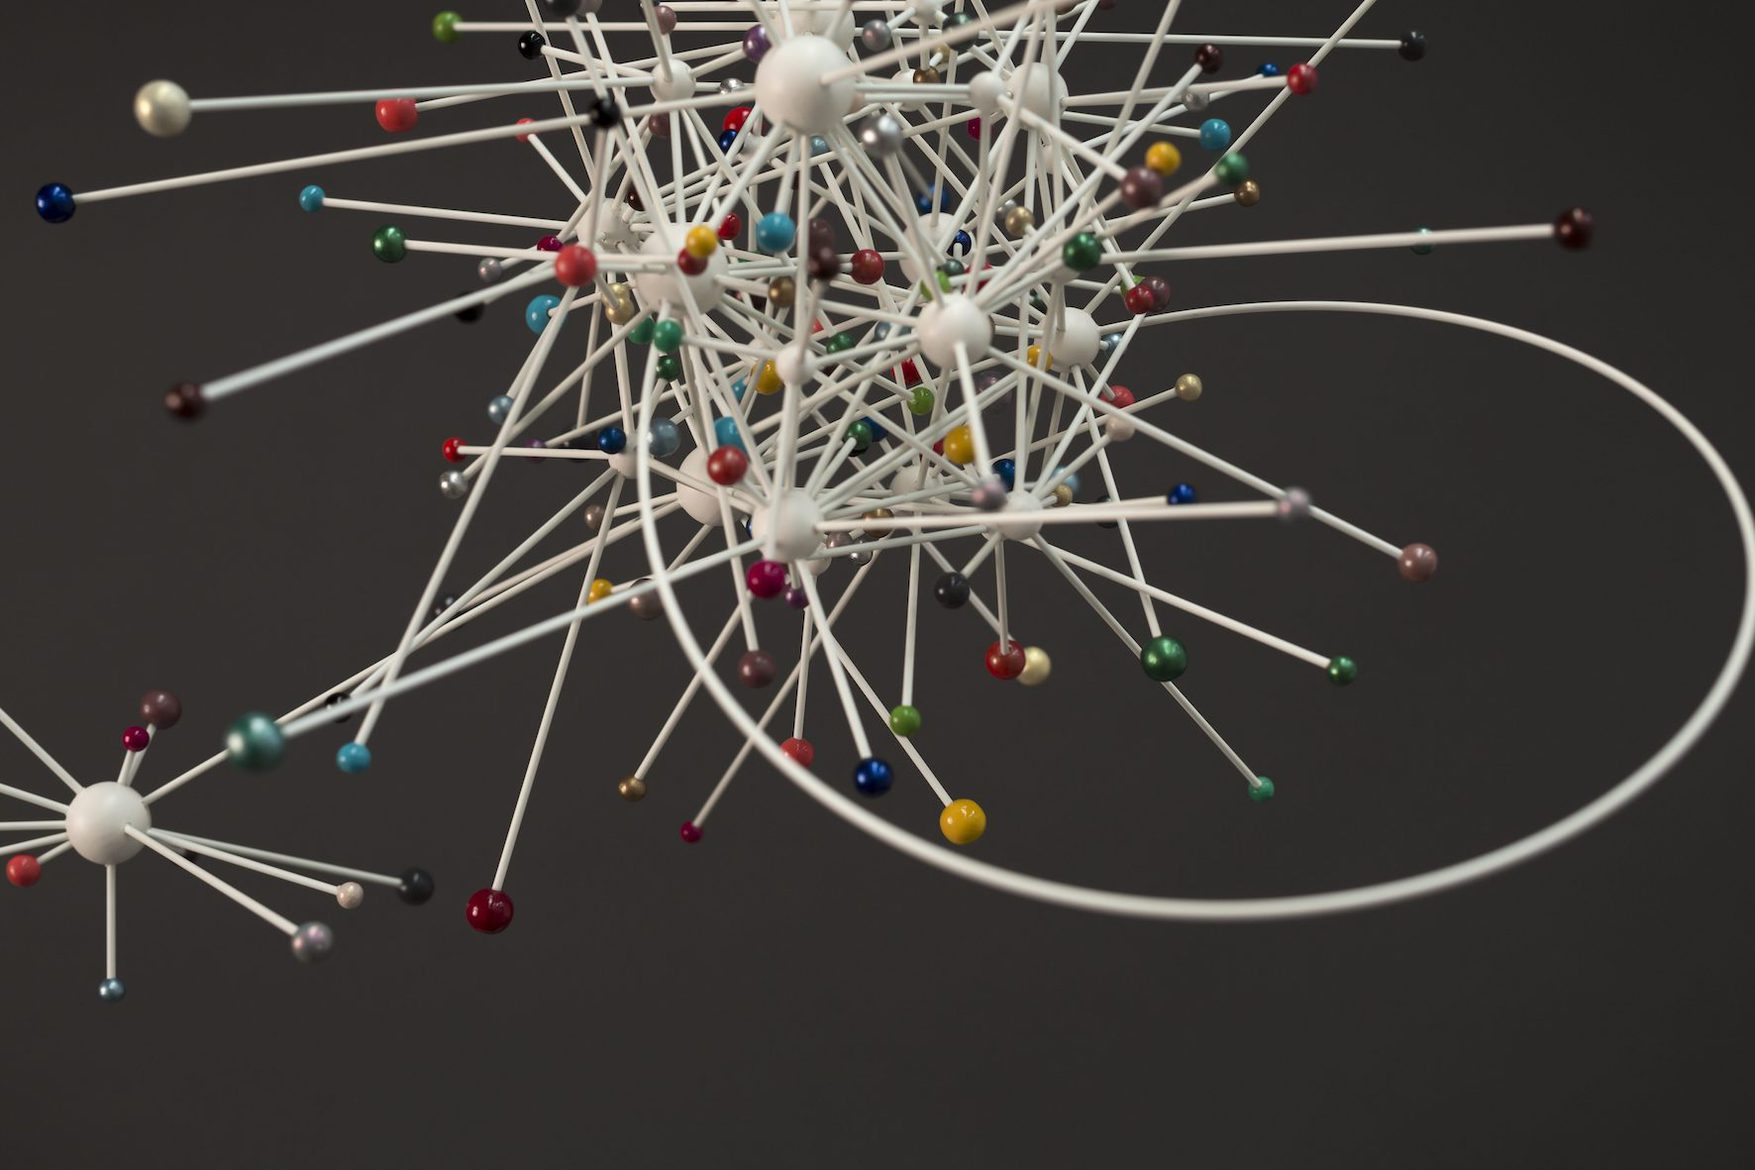 'WHIZZER' (detail), 2013, wooden spheres, glass fibre rods, nail lacquer, nylon filament, approximately 45 x 68 x 44 cm